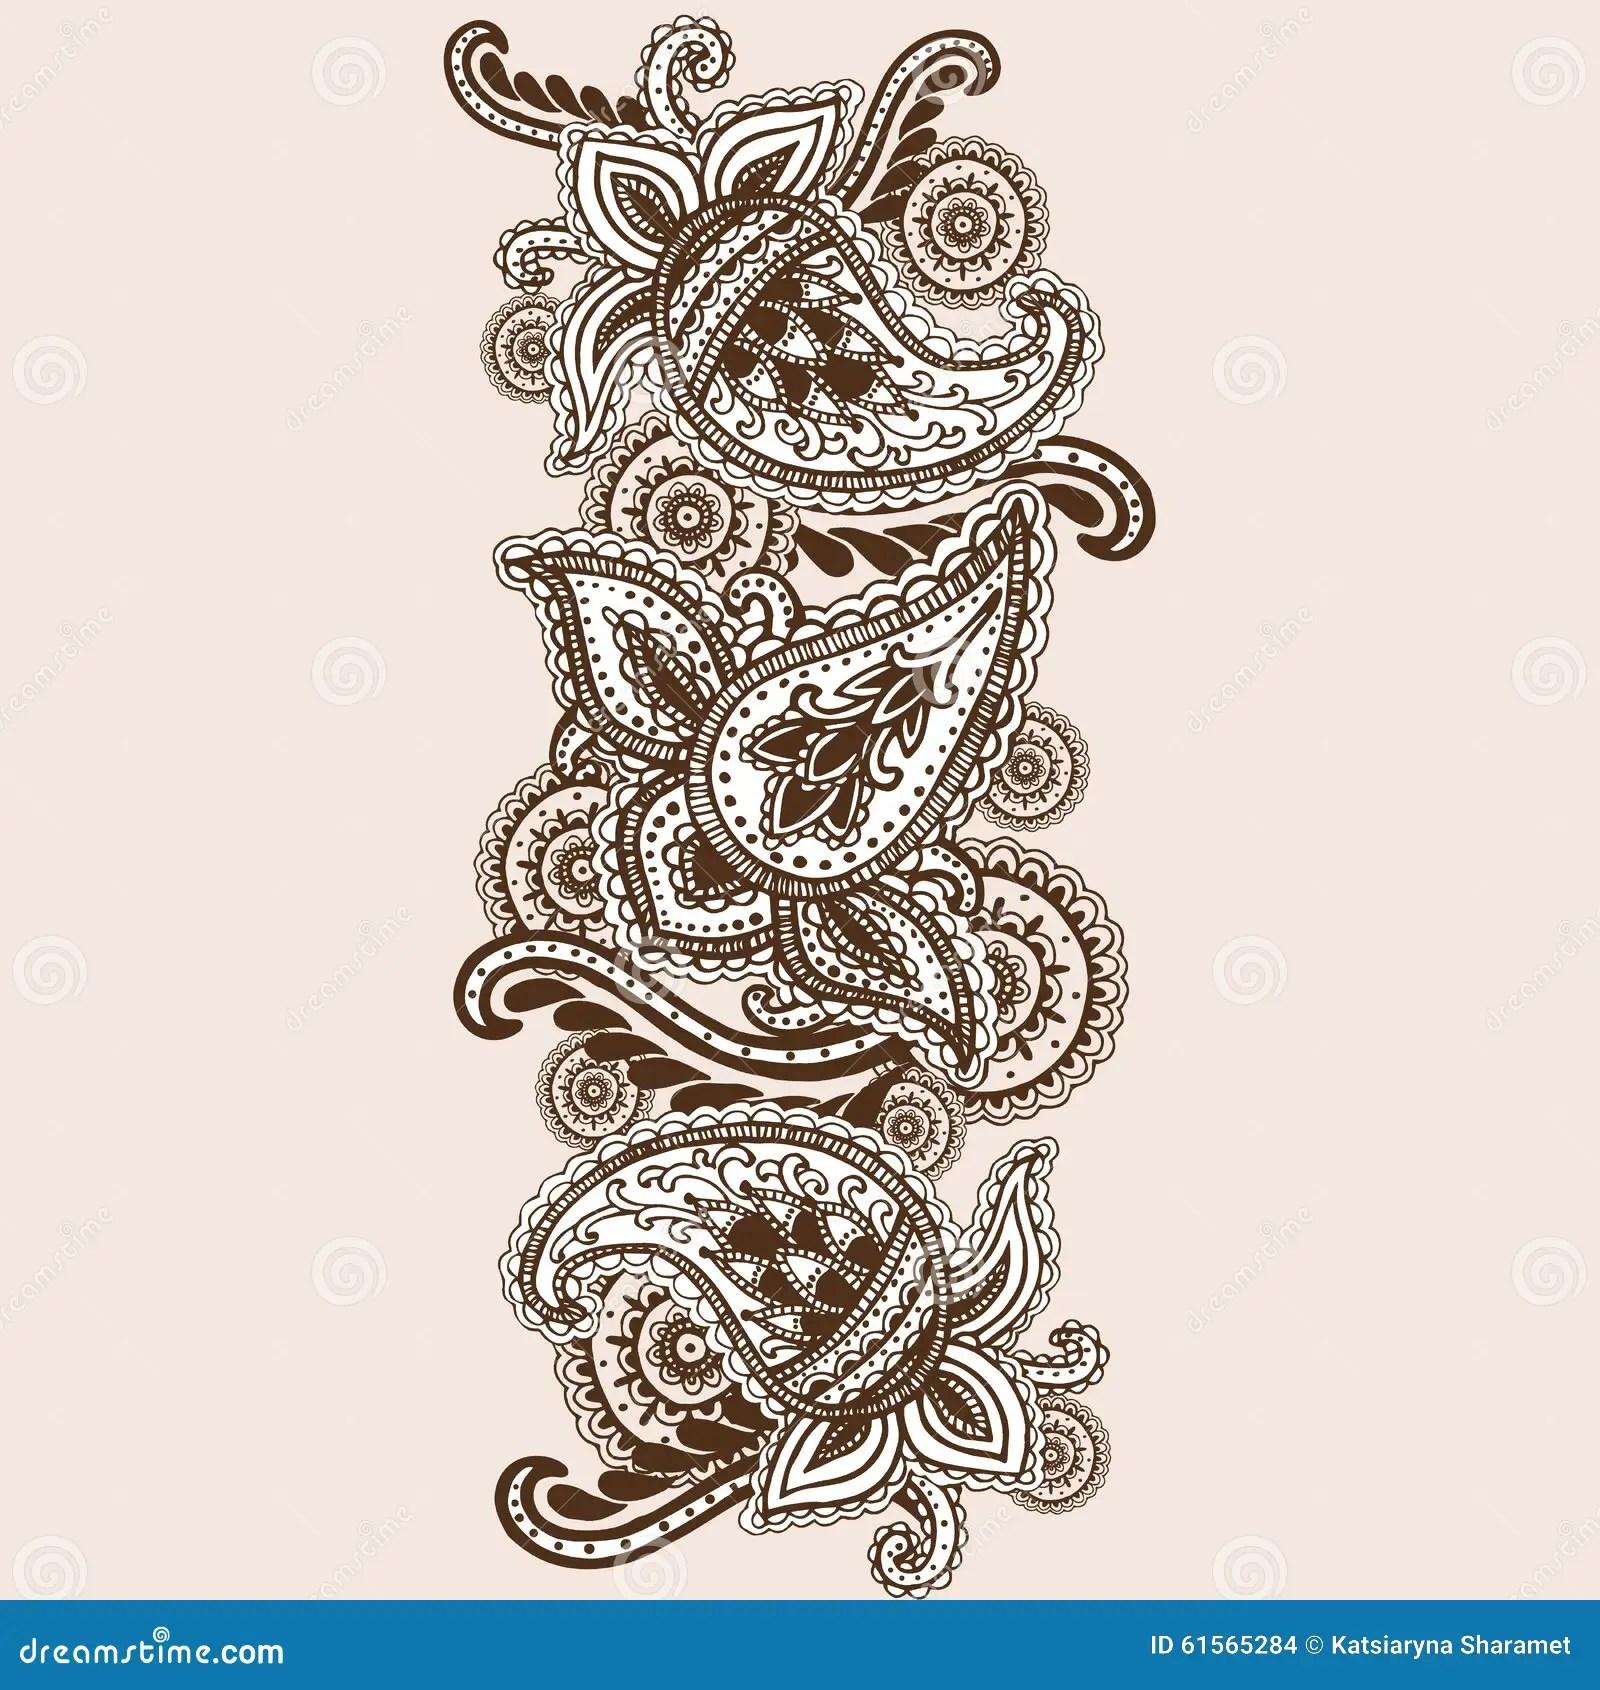 Hand Drawn Henna Mehndi Abstract Mandala Flowers And